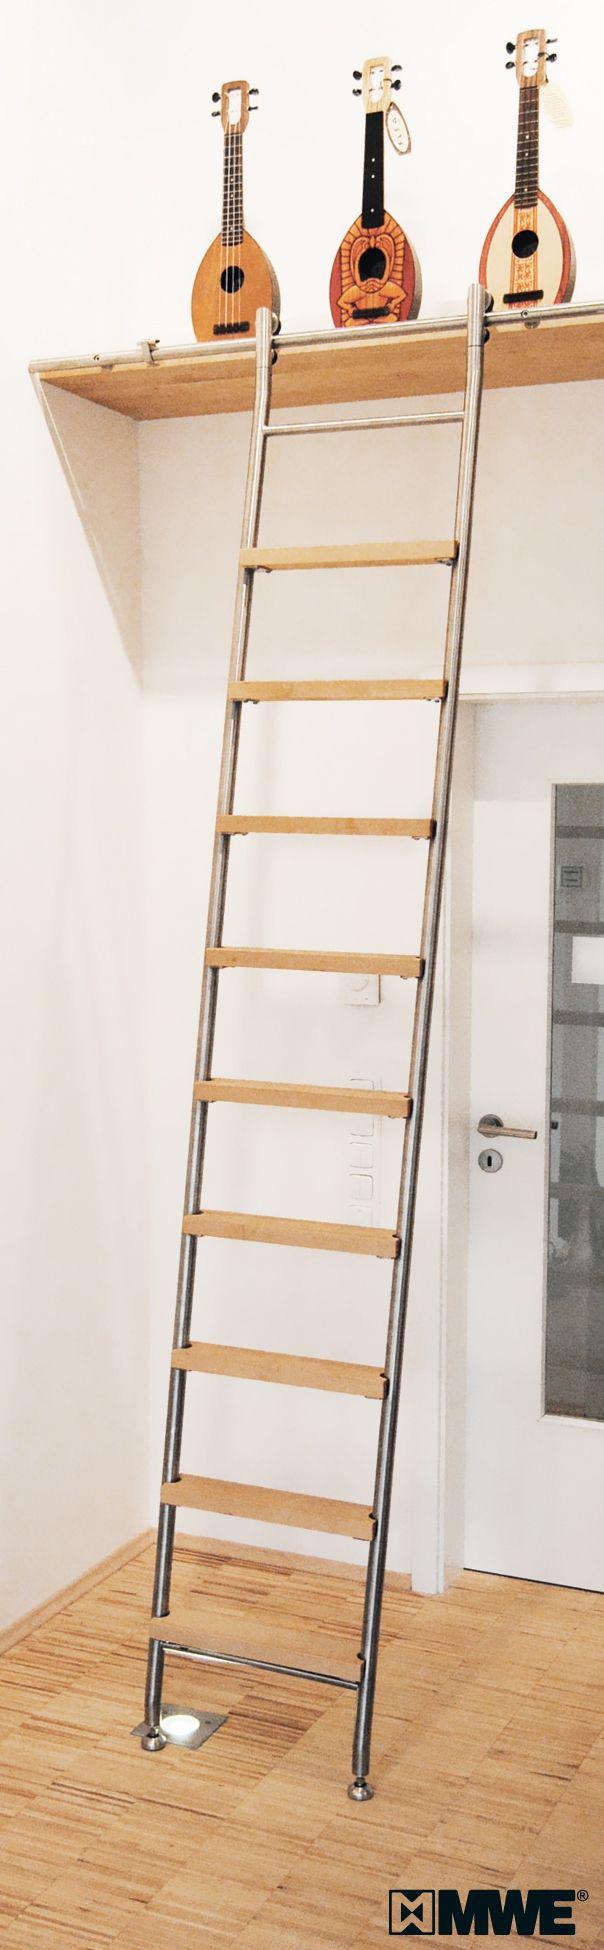 MWE SL.6004.KL Vario Ladder